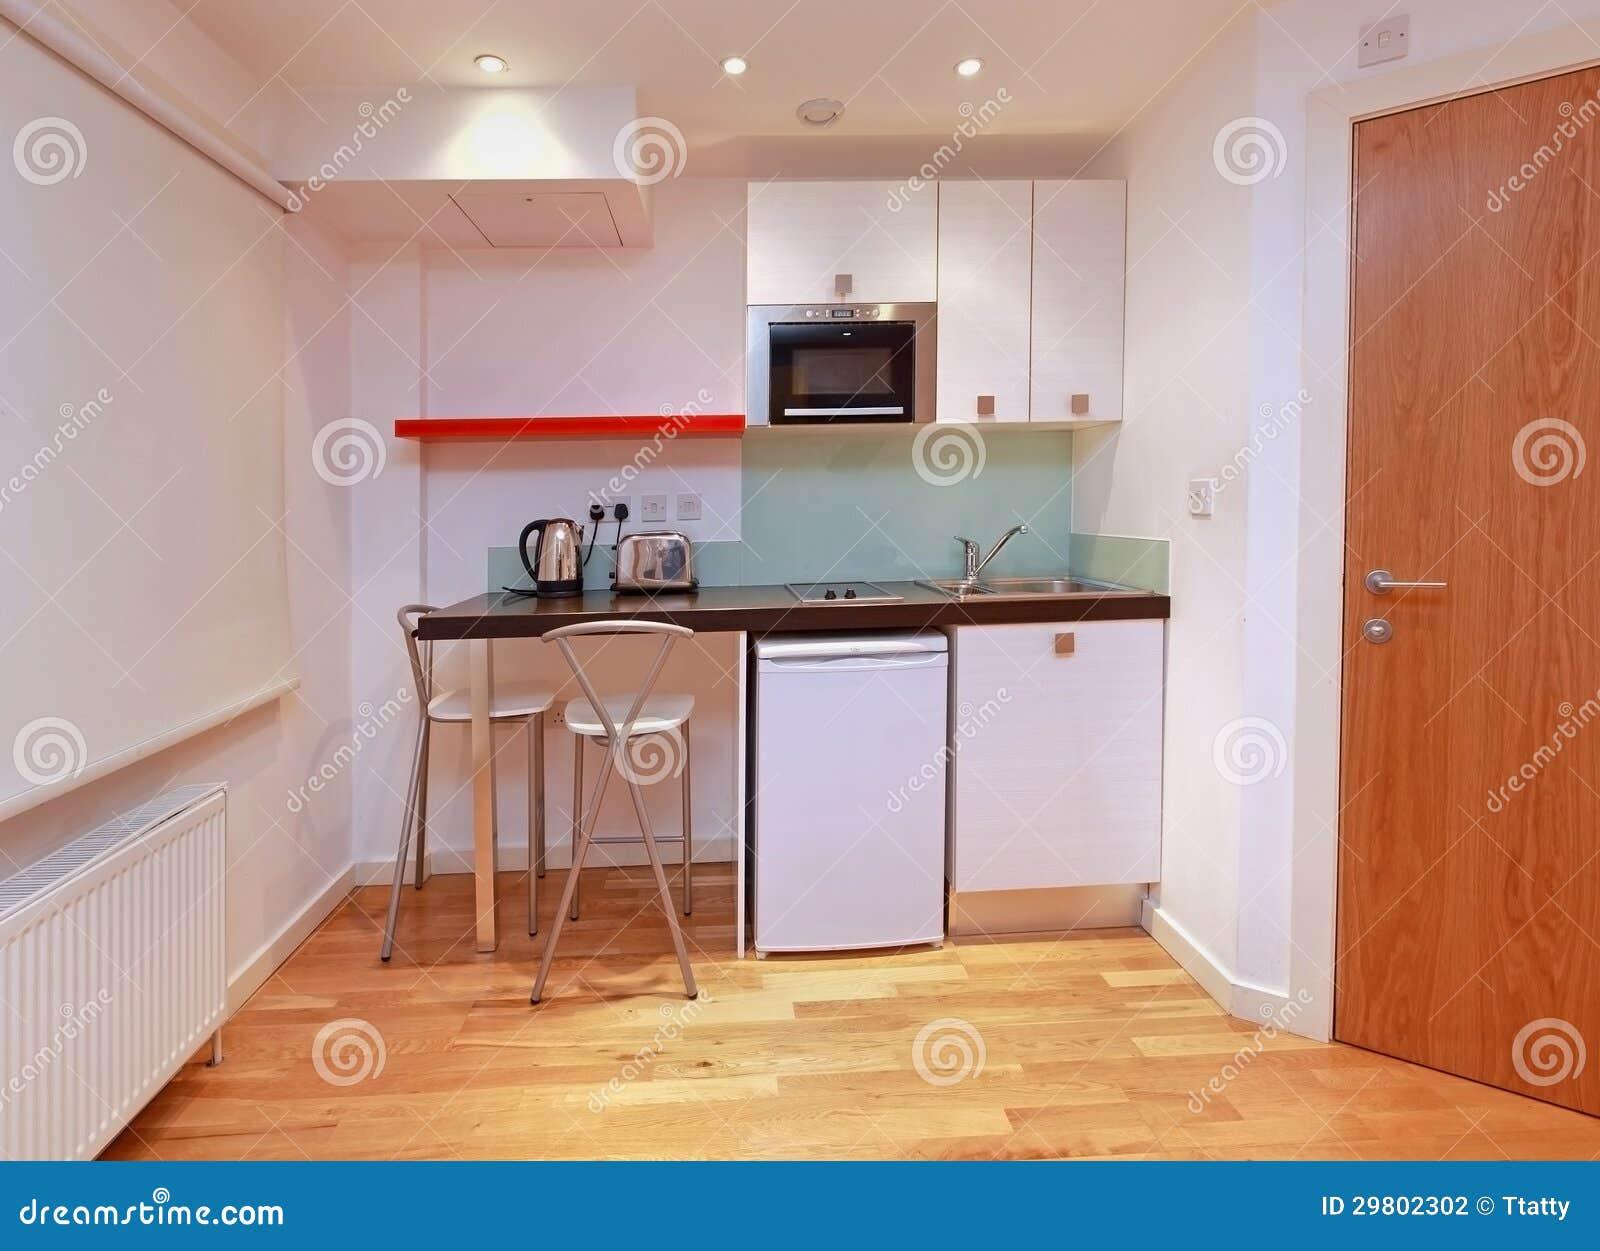 Pequeña cocina moderna foto de archivo. Imagen de grifo - 29802302